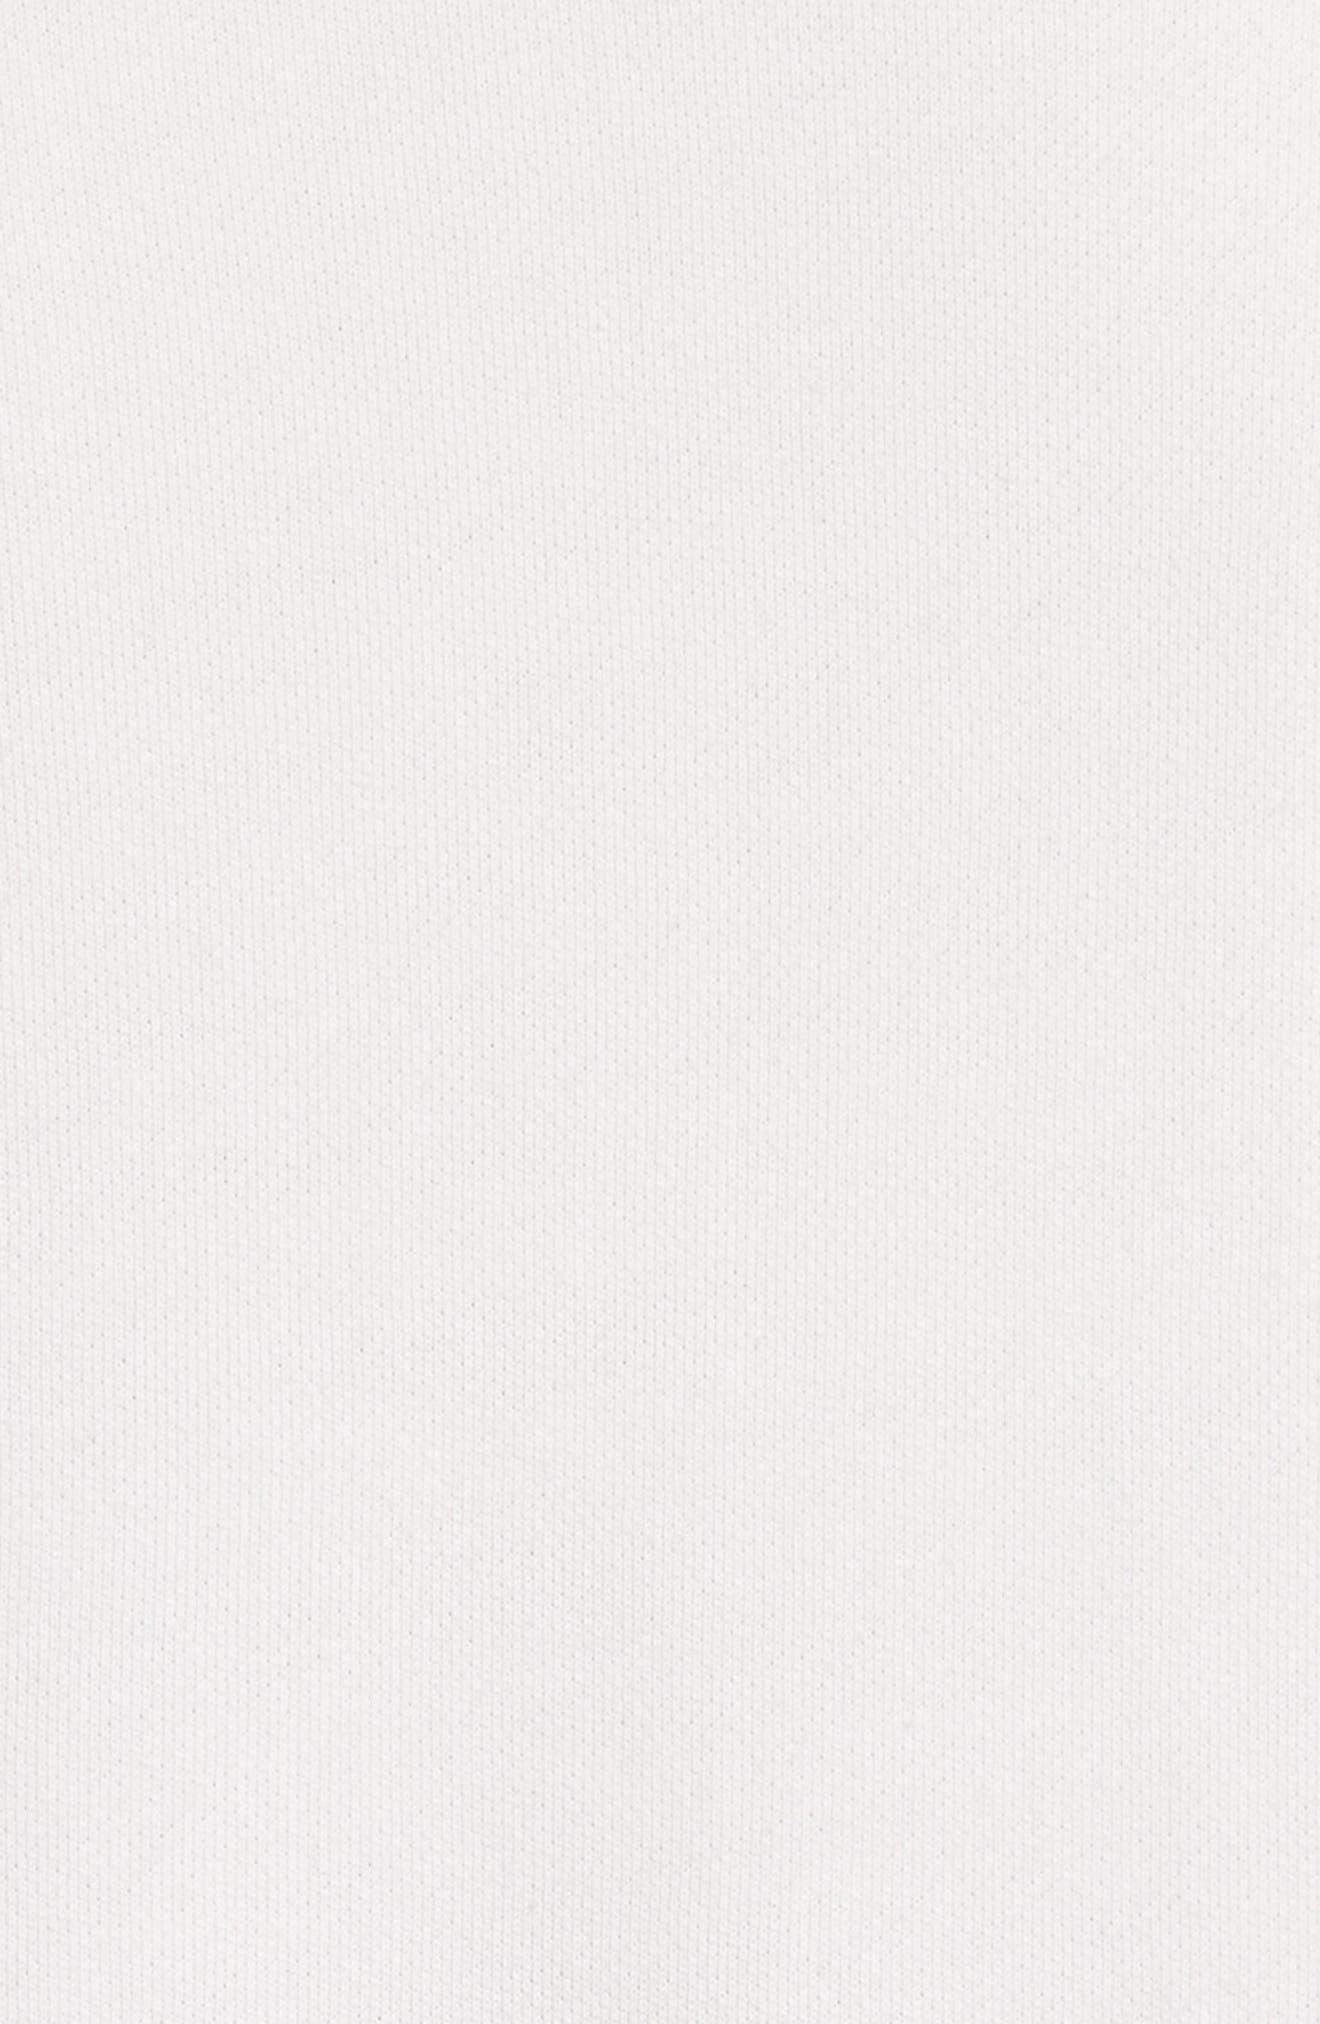 Gussie Colorblock Sweatshirt Dress,                             Alternate thumbnail 5, color,                             Black/ Off White